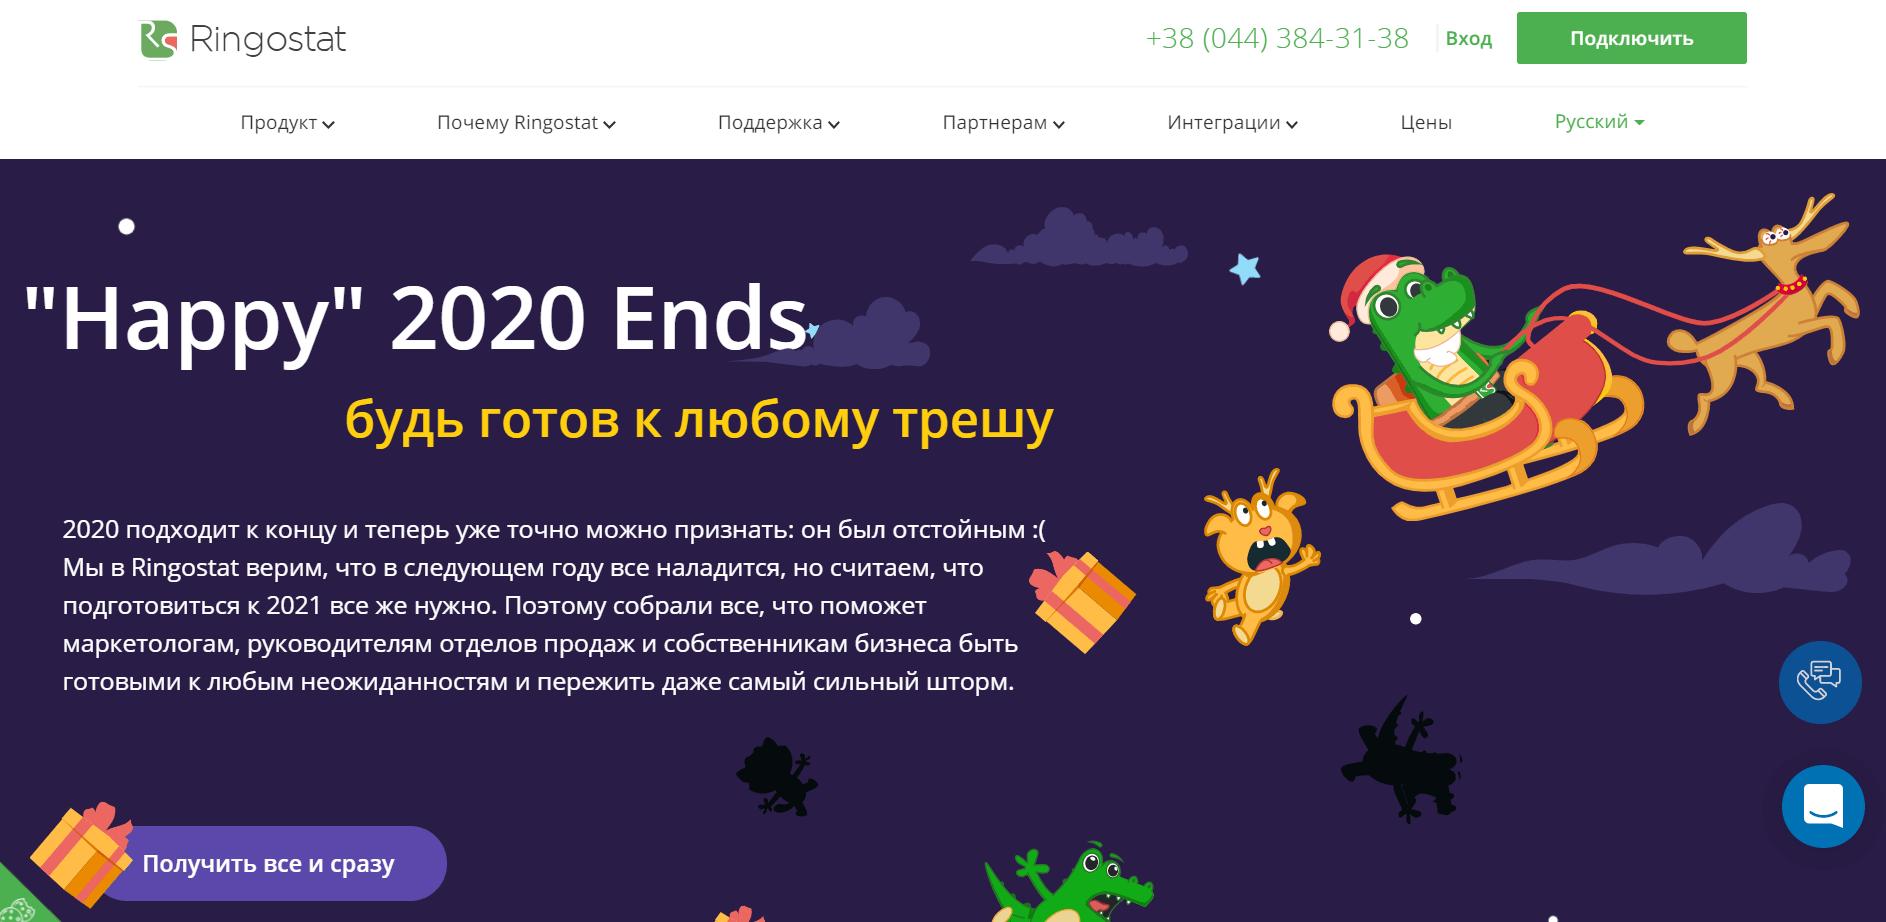 """Happy"" 2020 Ends Ringostat"